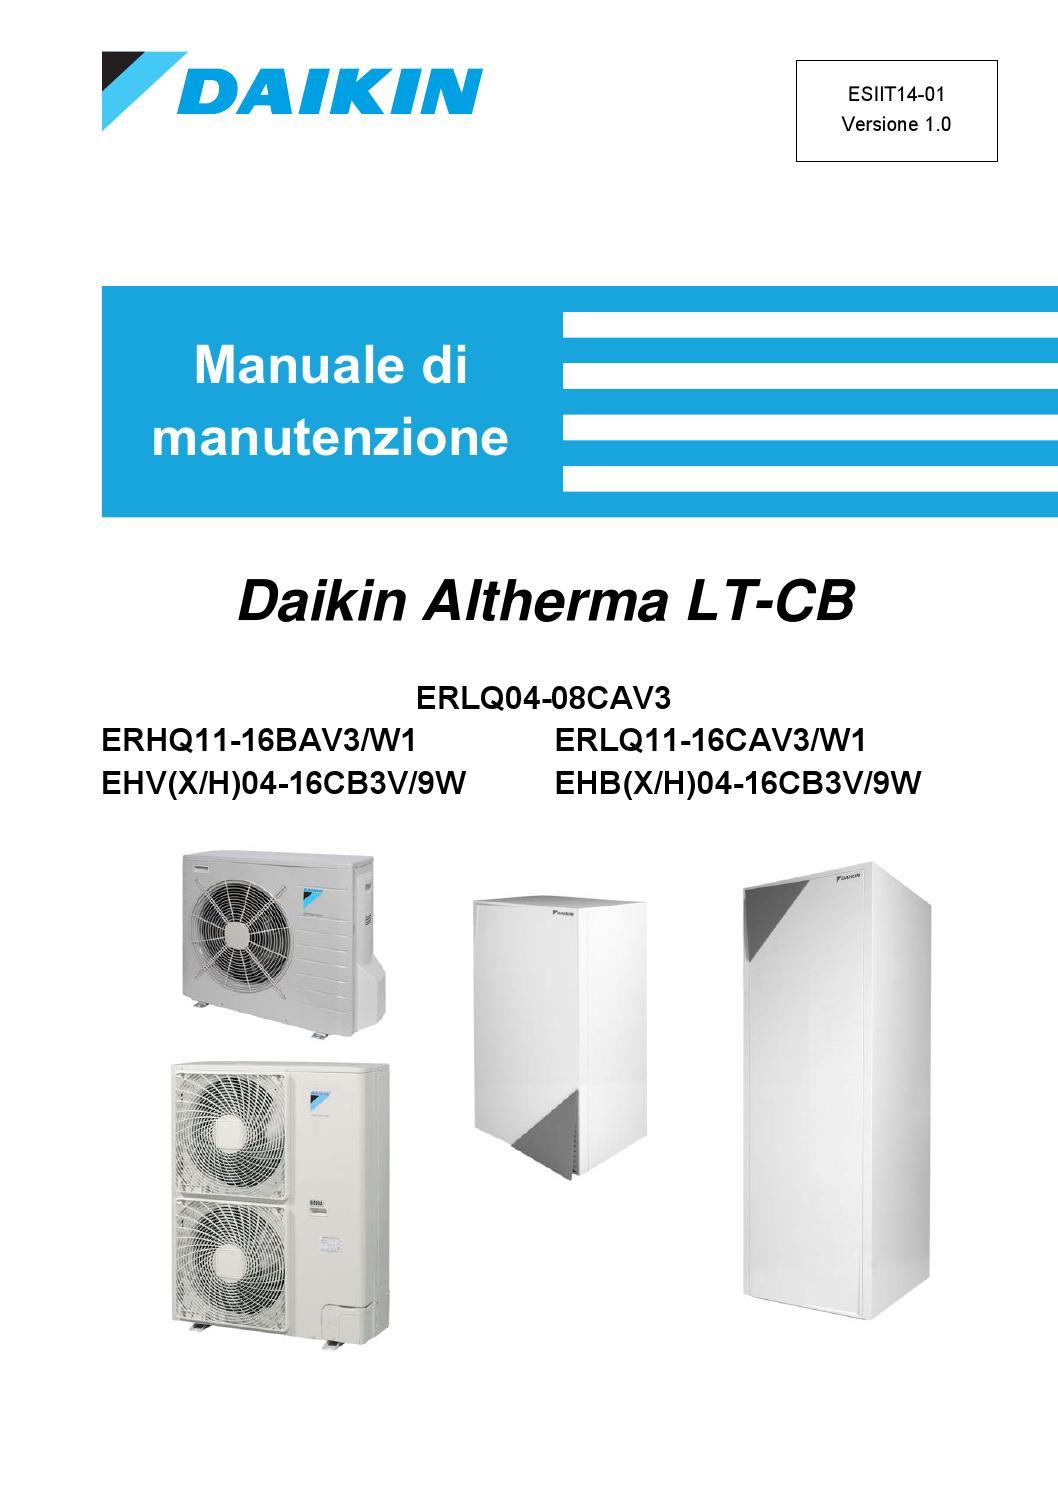 Schema Elettrico Daikin : Daikin altherma lt cb italian service manual by paulo moreno issuu